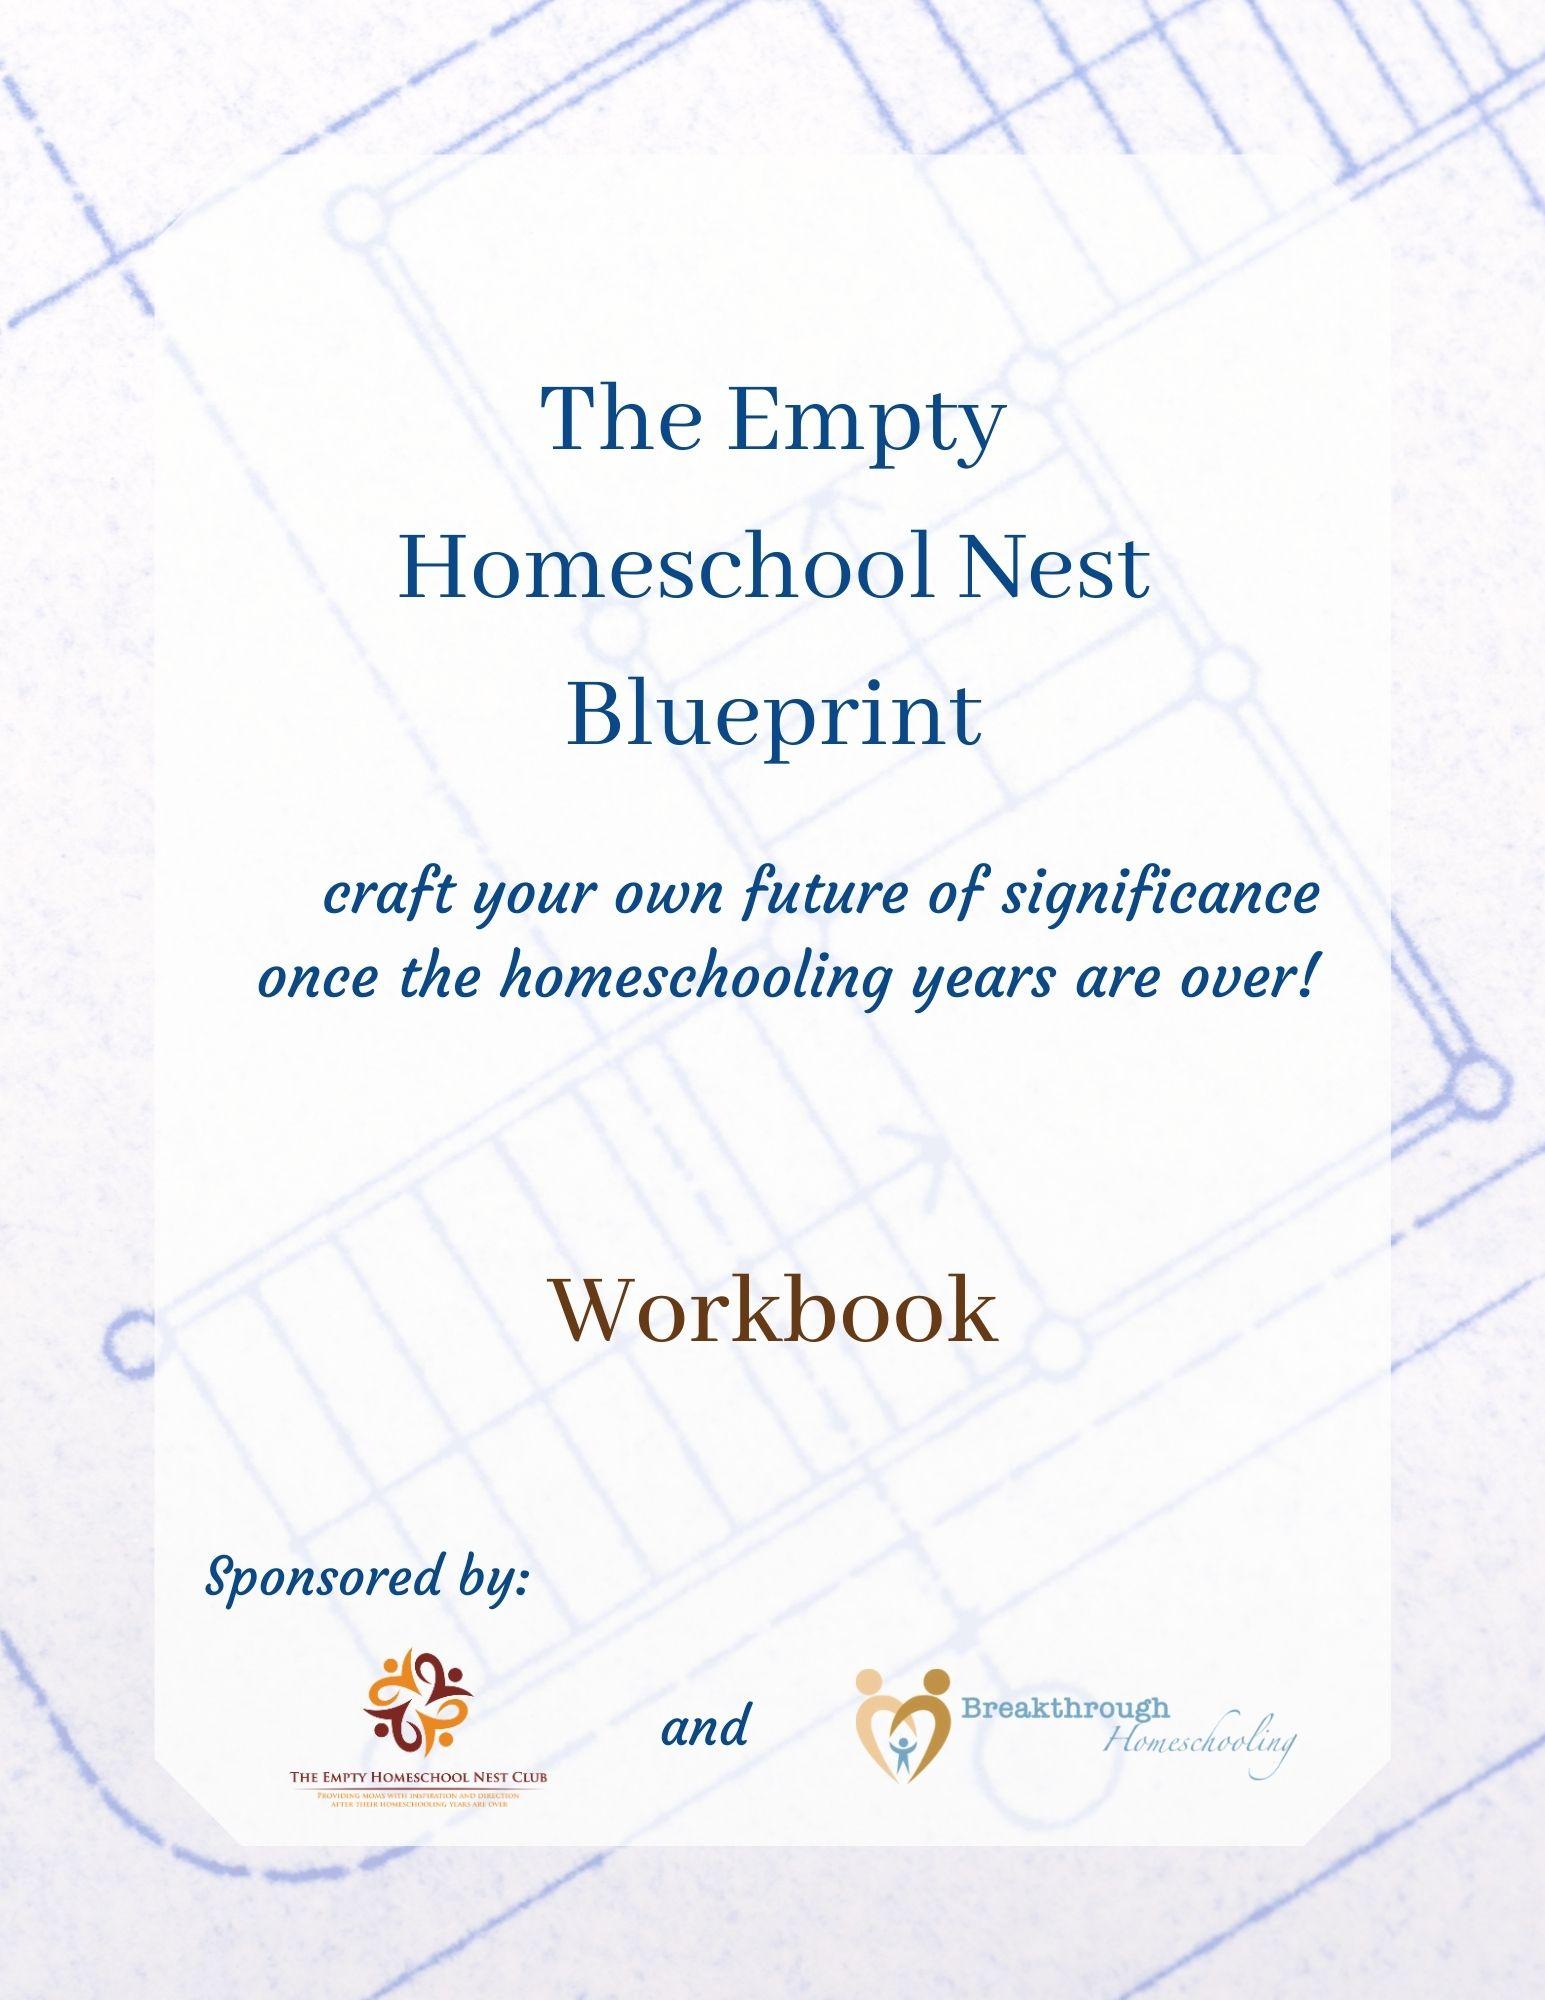 The Empty Homeschool Nest Blueprint